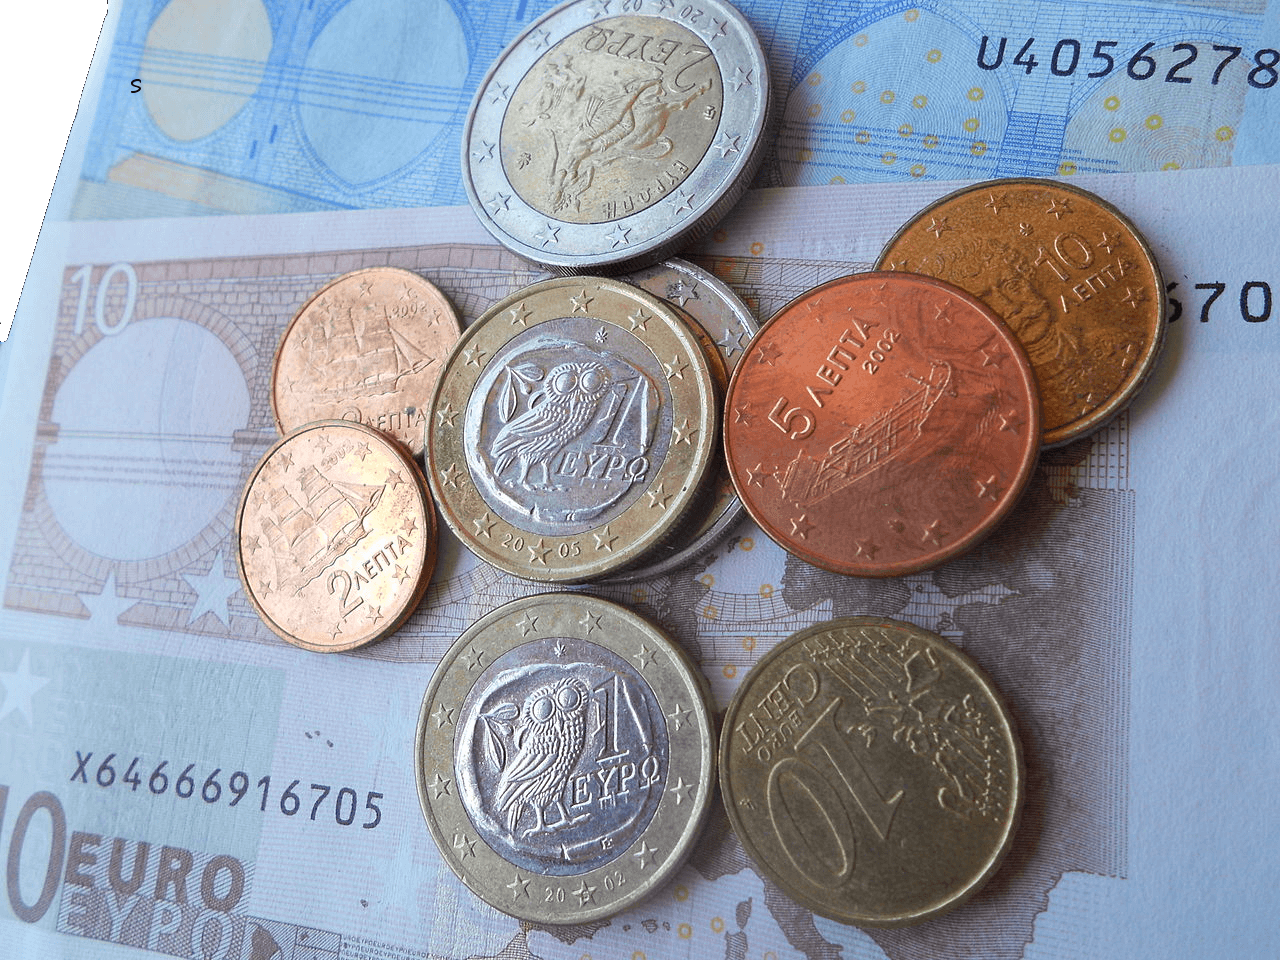 Griechenland: Zahlungsunfähigkeit droht